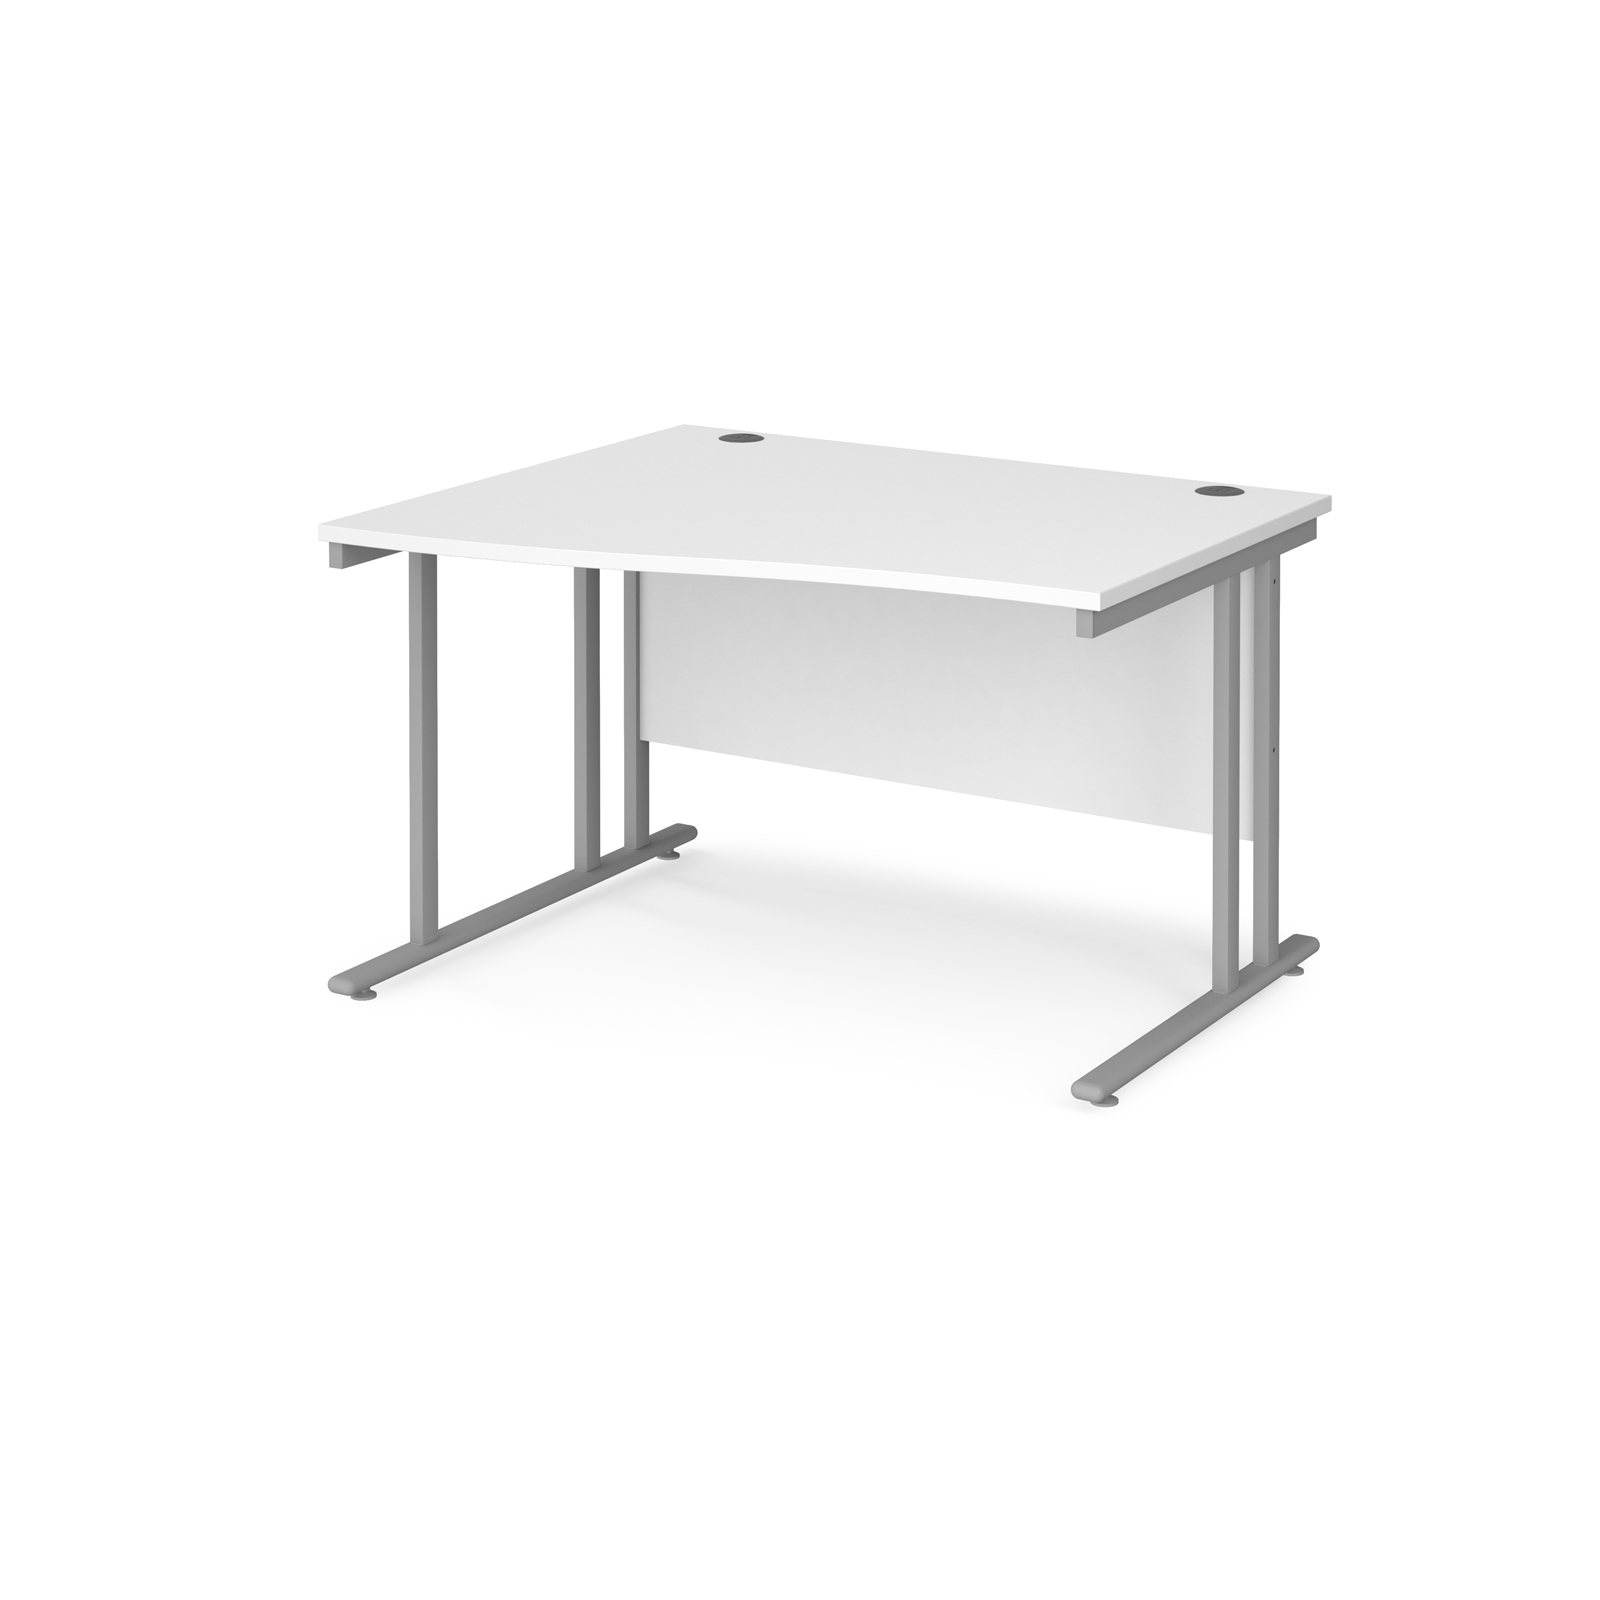 Left Handed Maestro 25 left hand wave desk 1200mm wide - silver cantilever leg frame, white top